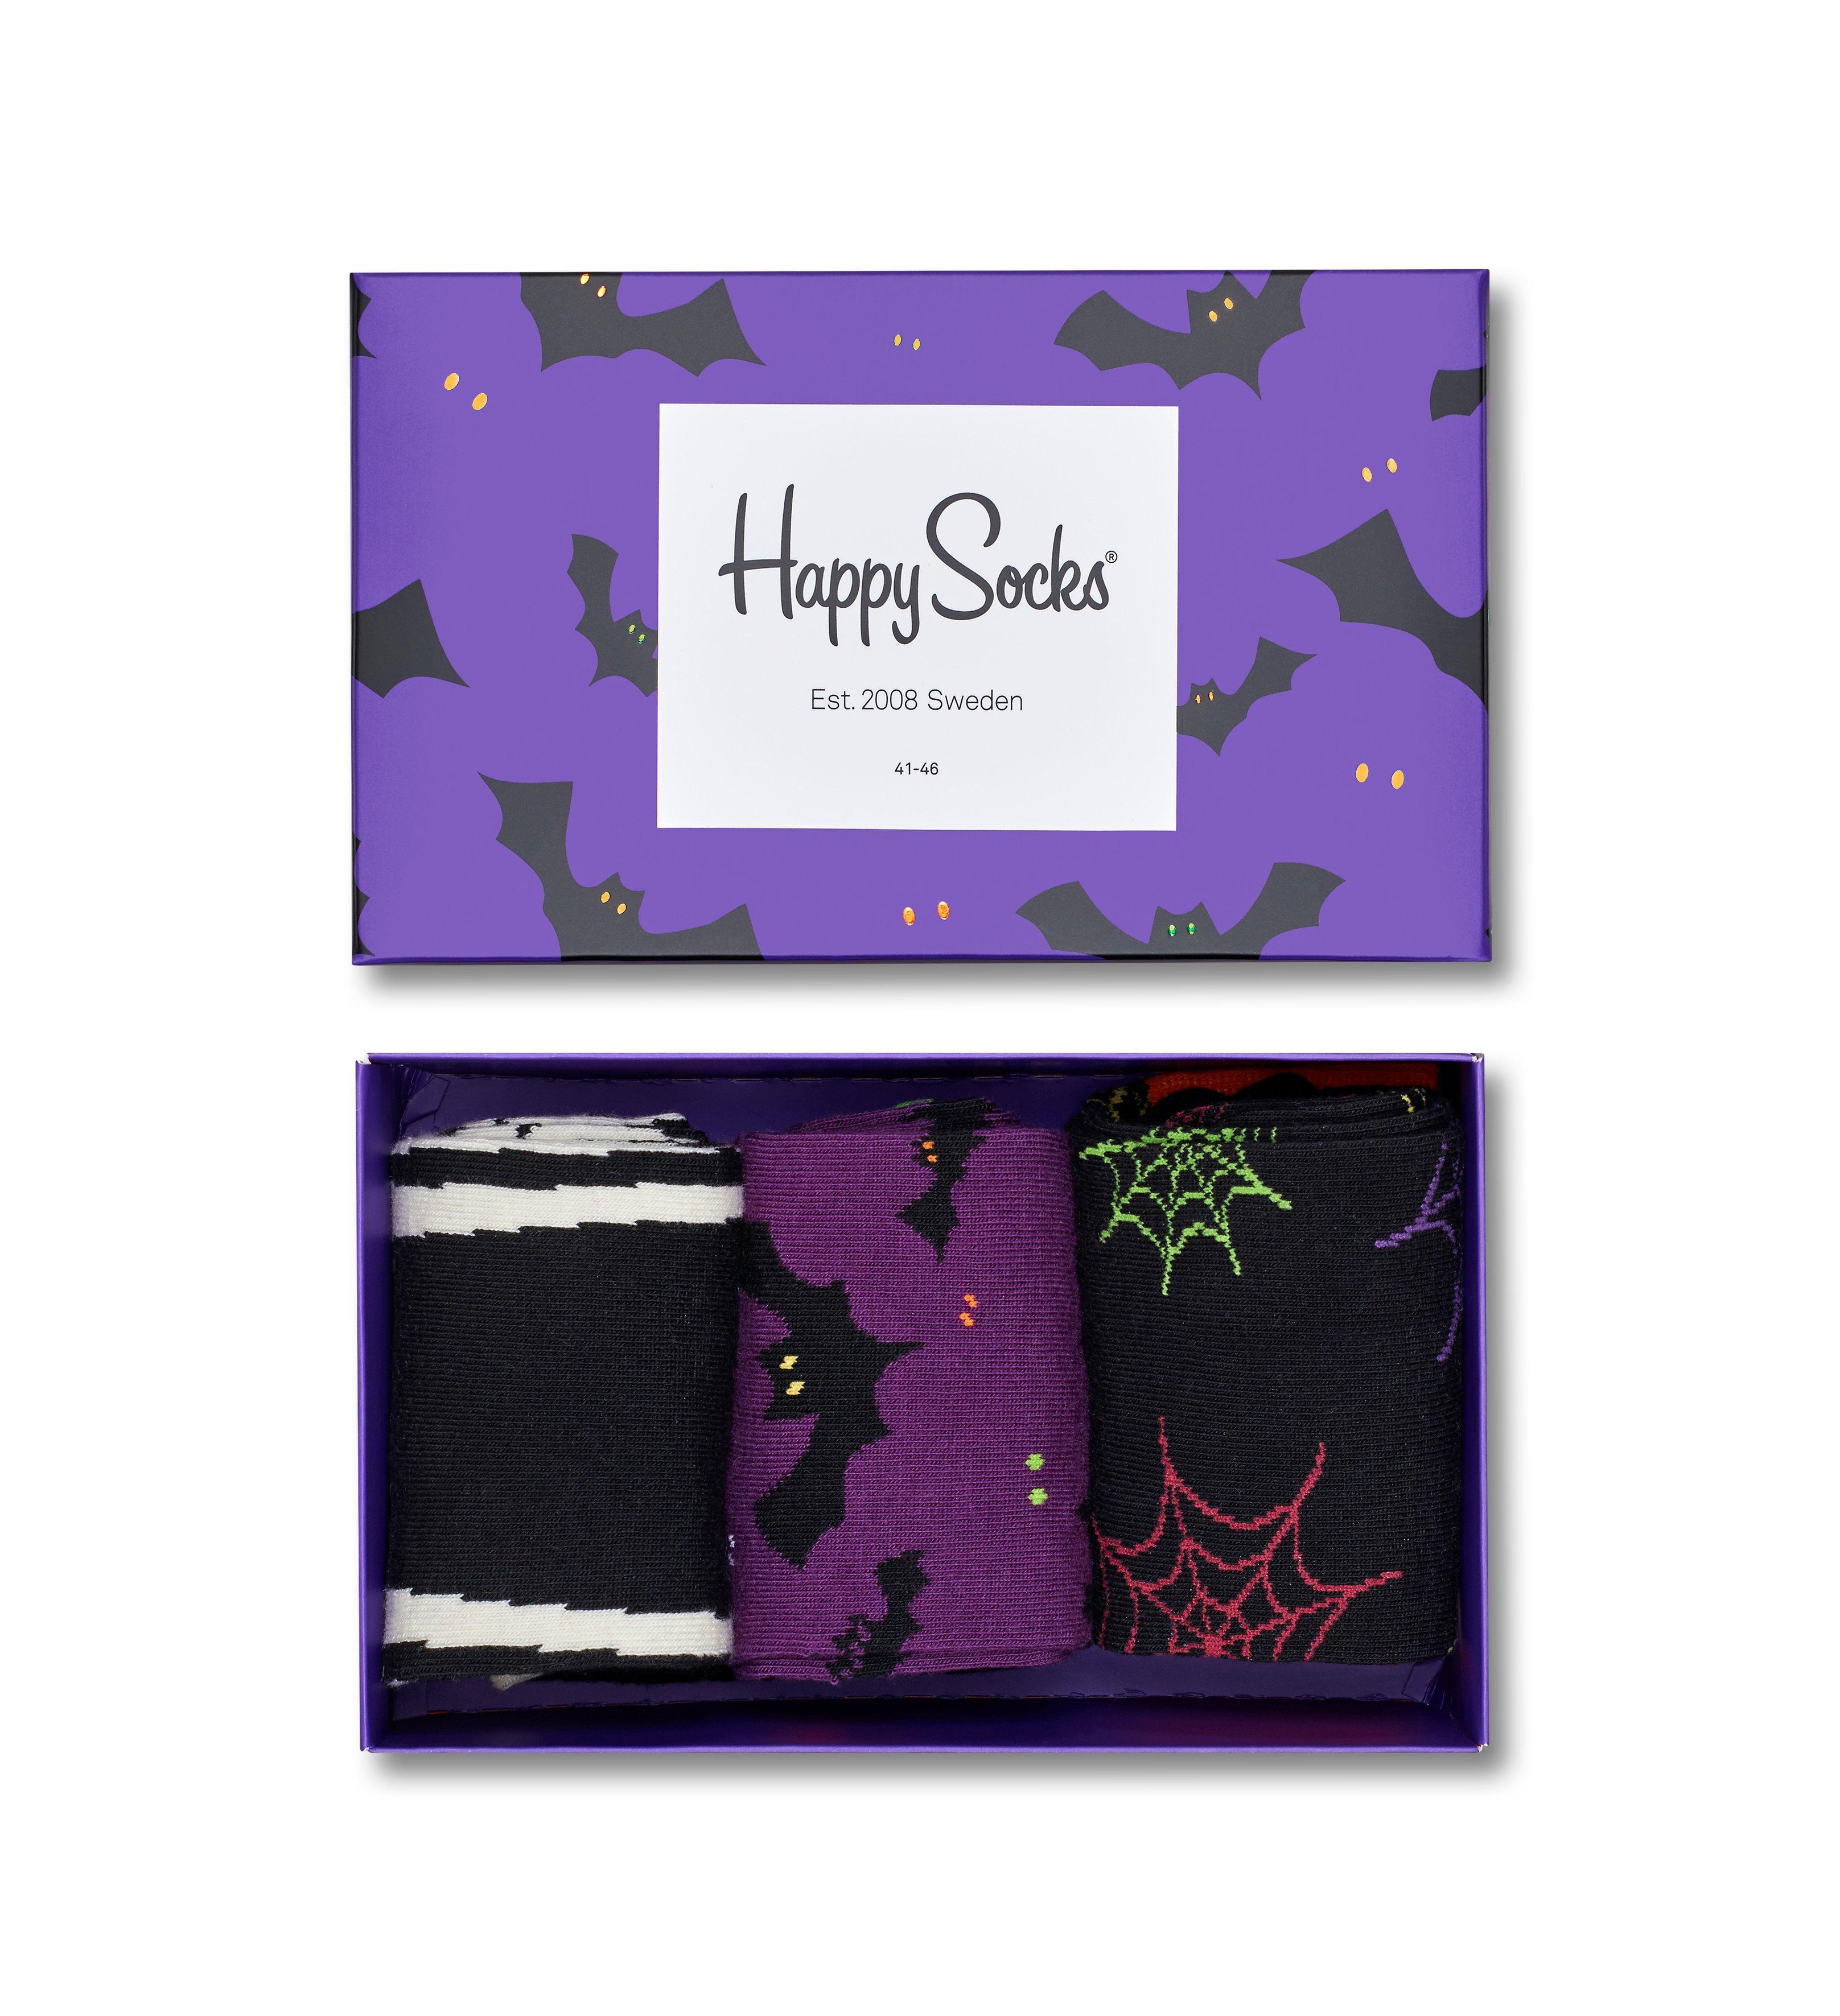 Dárková krabička Happy Socks Halloween 1, unisex - S-M (36-40)